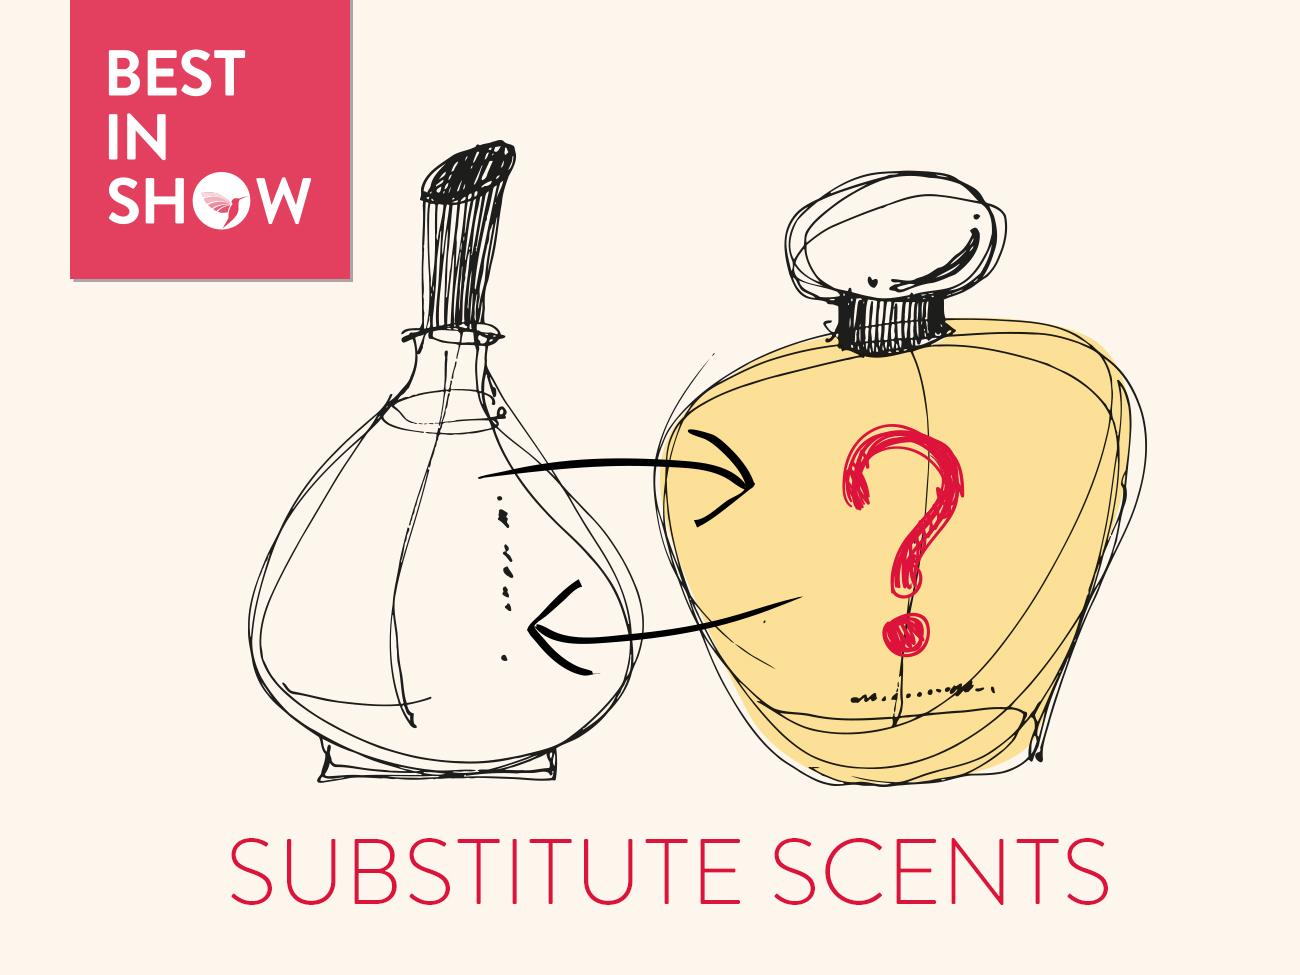 Substitute Scents